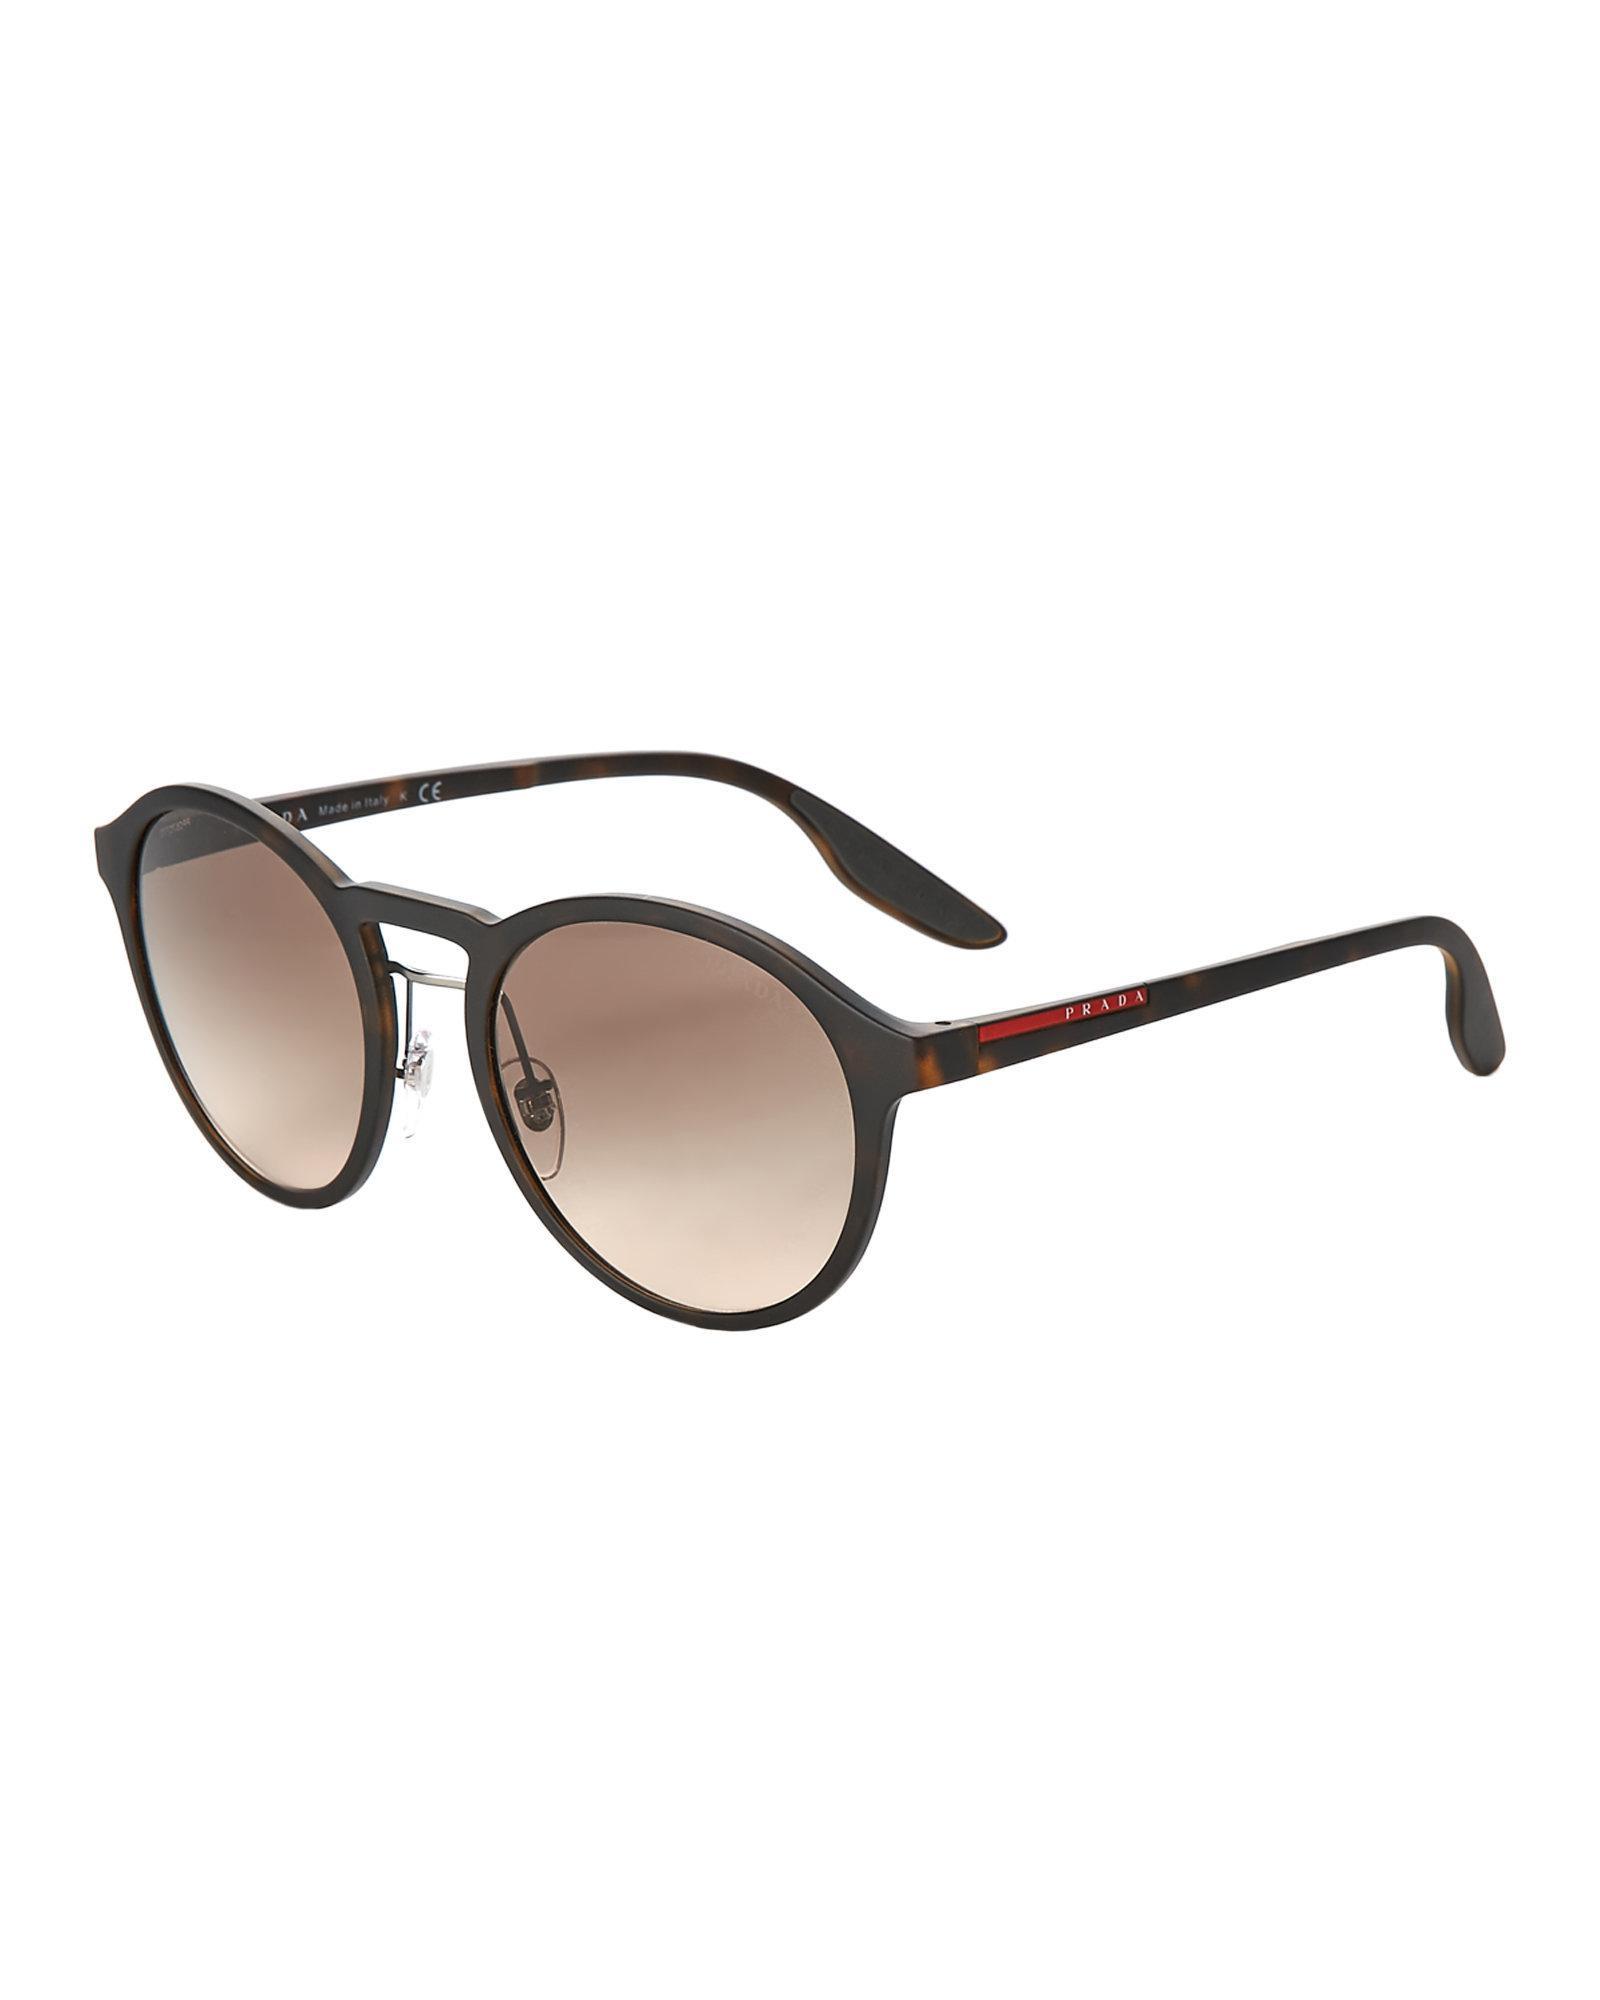 262f78bf69f1 ... closeout lyst prada sport sps 01s tortoiseshell look round sunglasses  in 537c0 27b7d ...